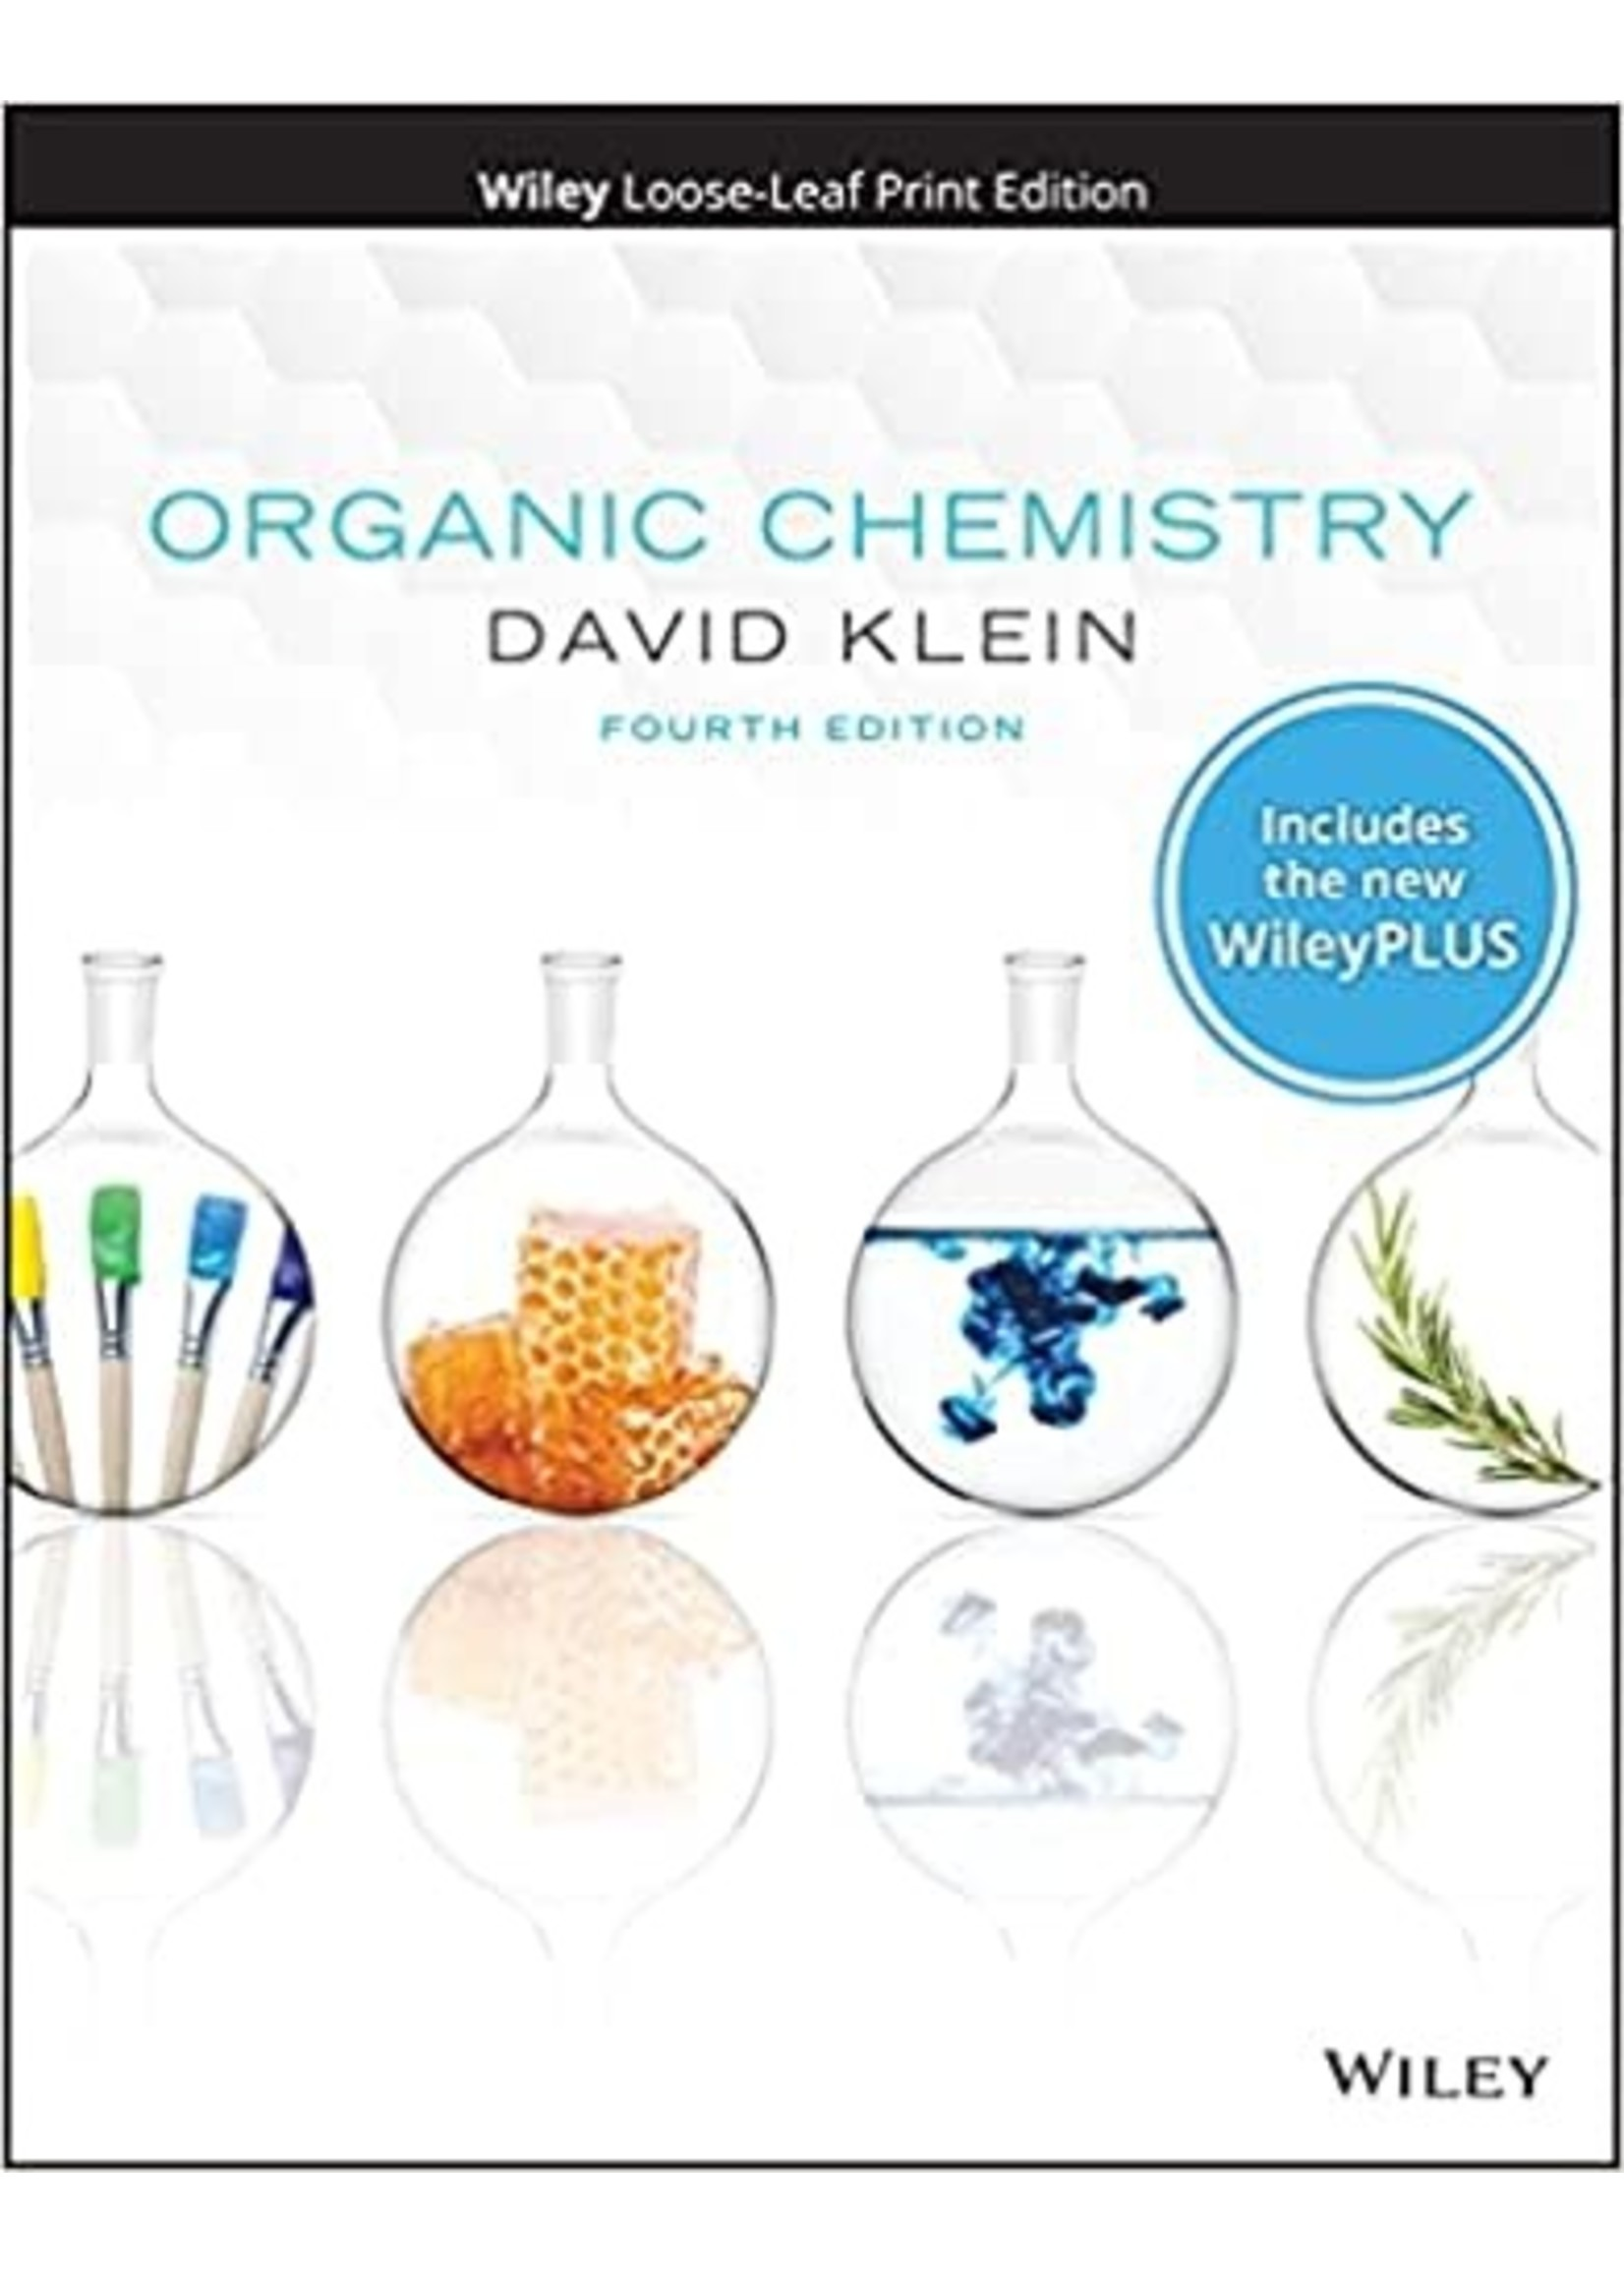 CHEM221 ORGANIC CHEMISTRY- NEXT GEN ACCESS (2 SEMESTERS)